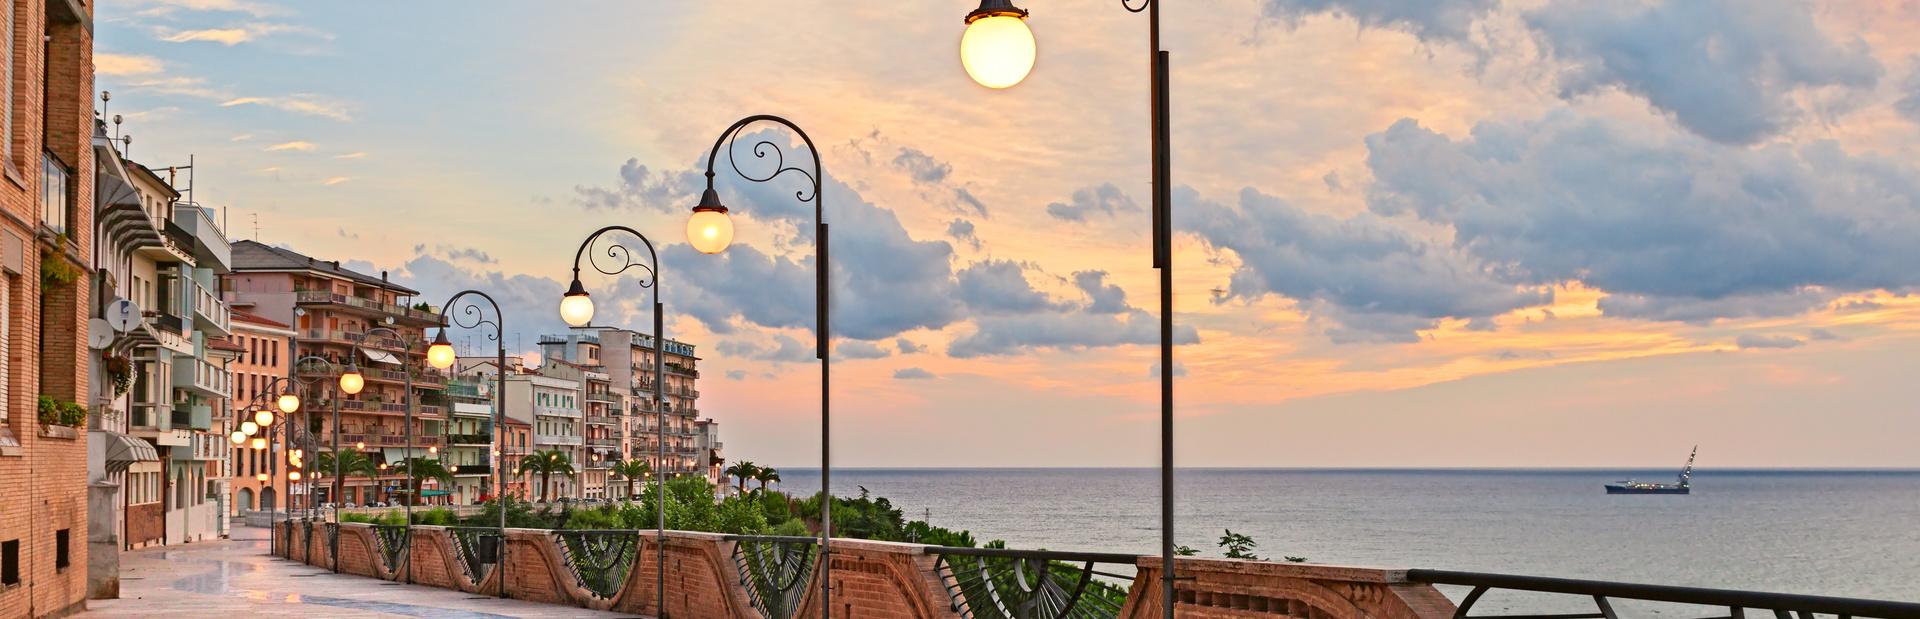 East Coast Italy news photo